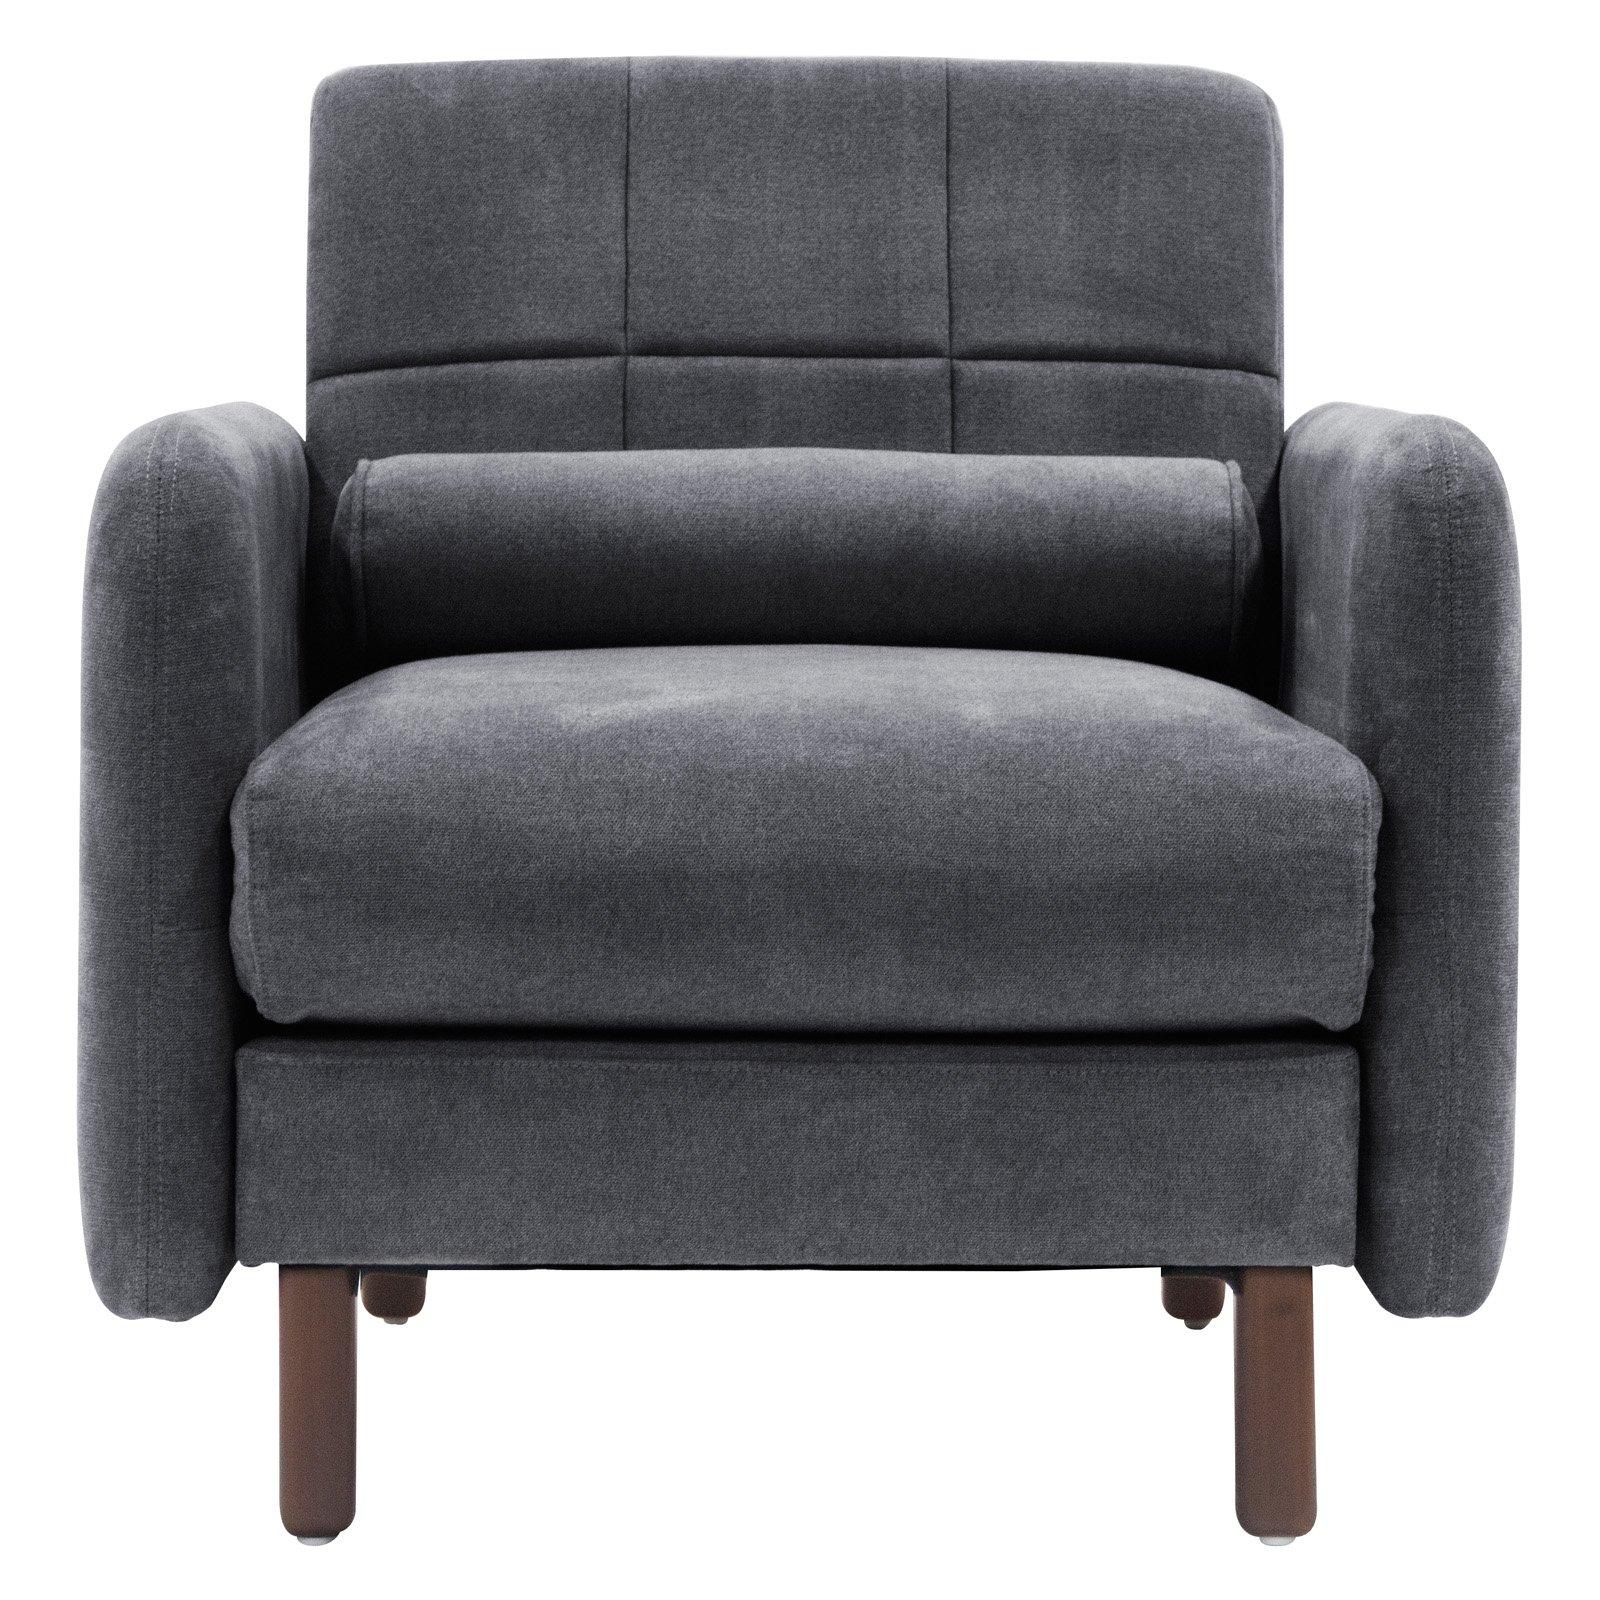 Serta Savanna Arm Chair